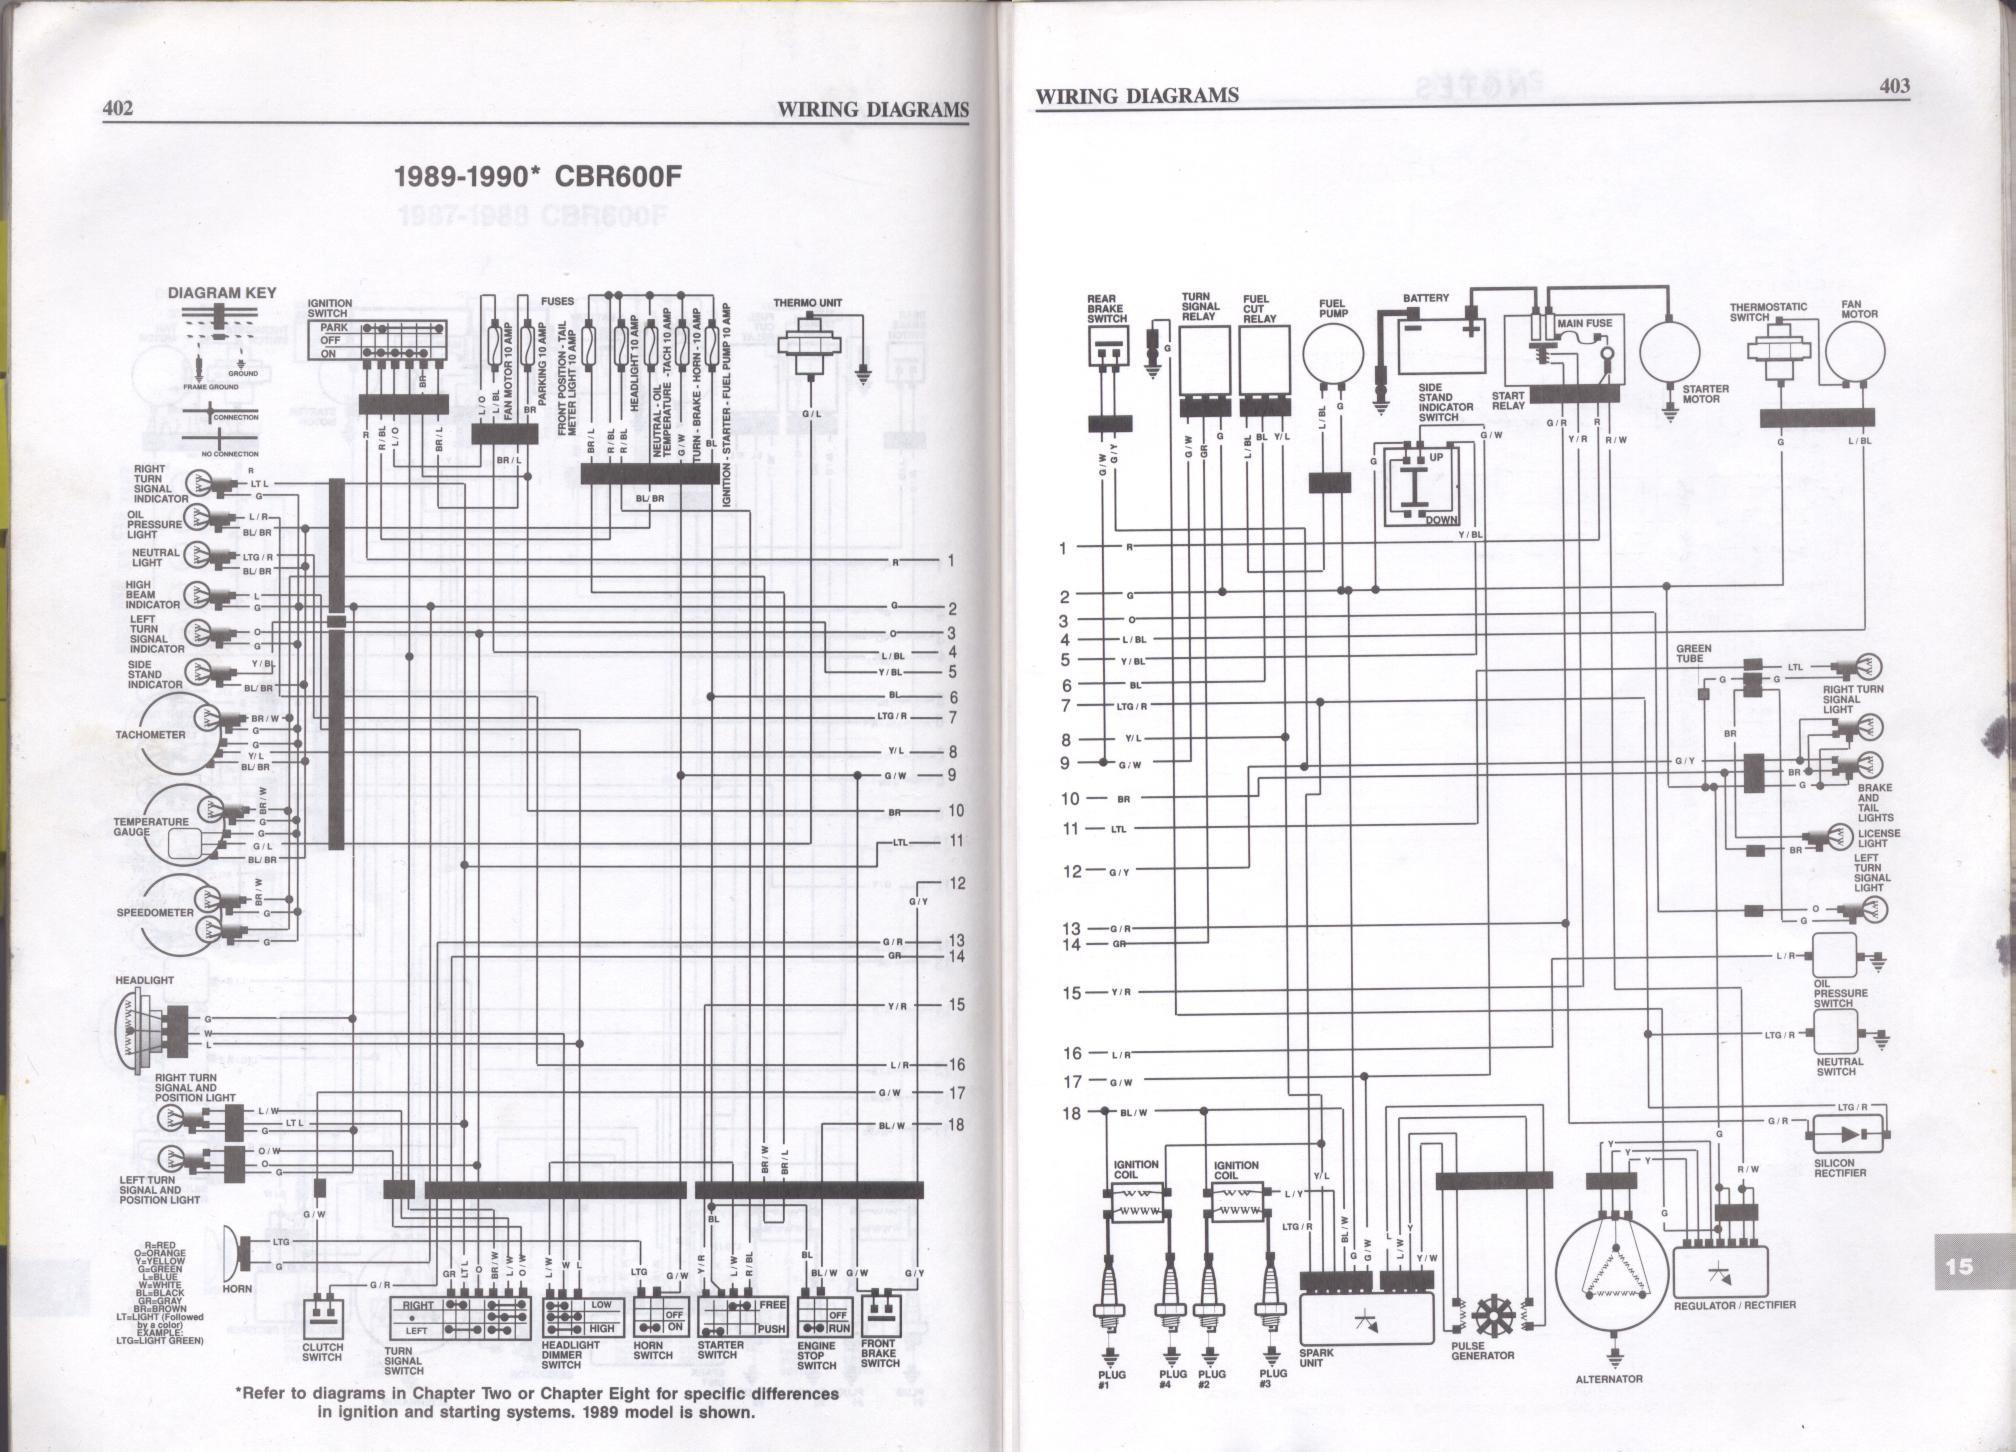 honda wiring diagrams honda cb 900 wiring diagram honda wiring honda xr 250 wiring diagram honda cb 900 wiring diagram honda wiring diagrams instructions